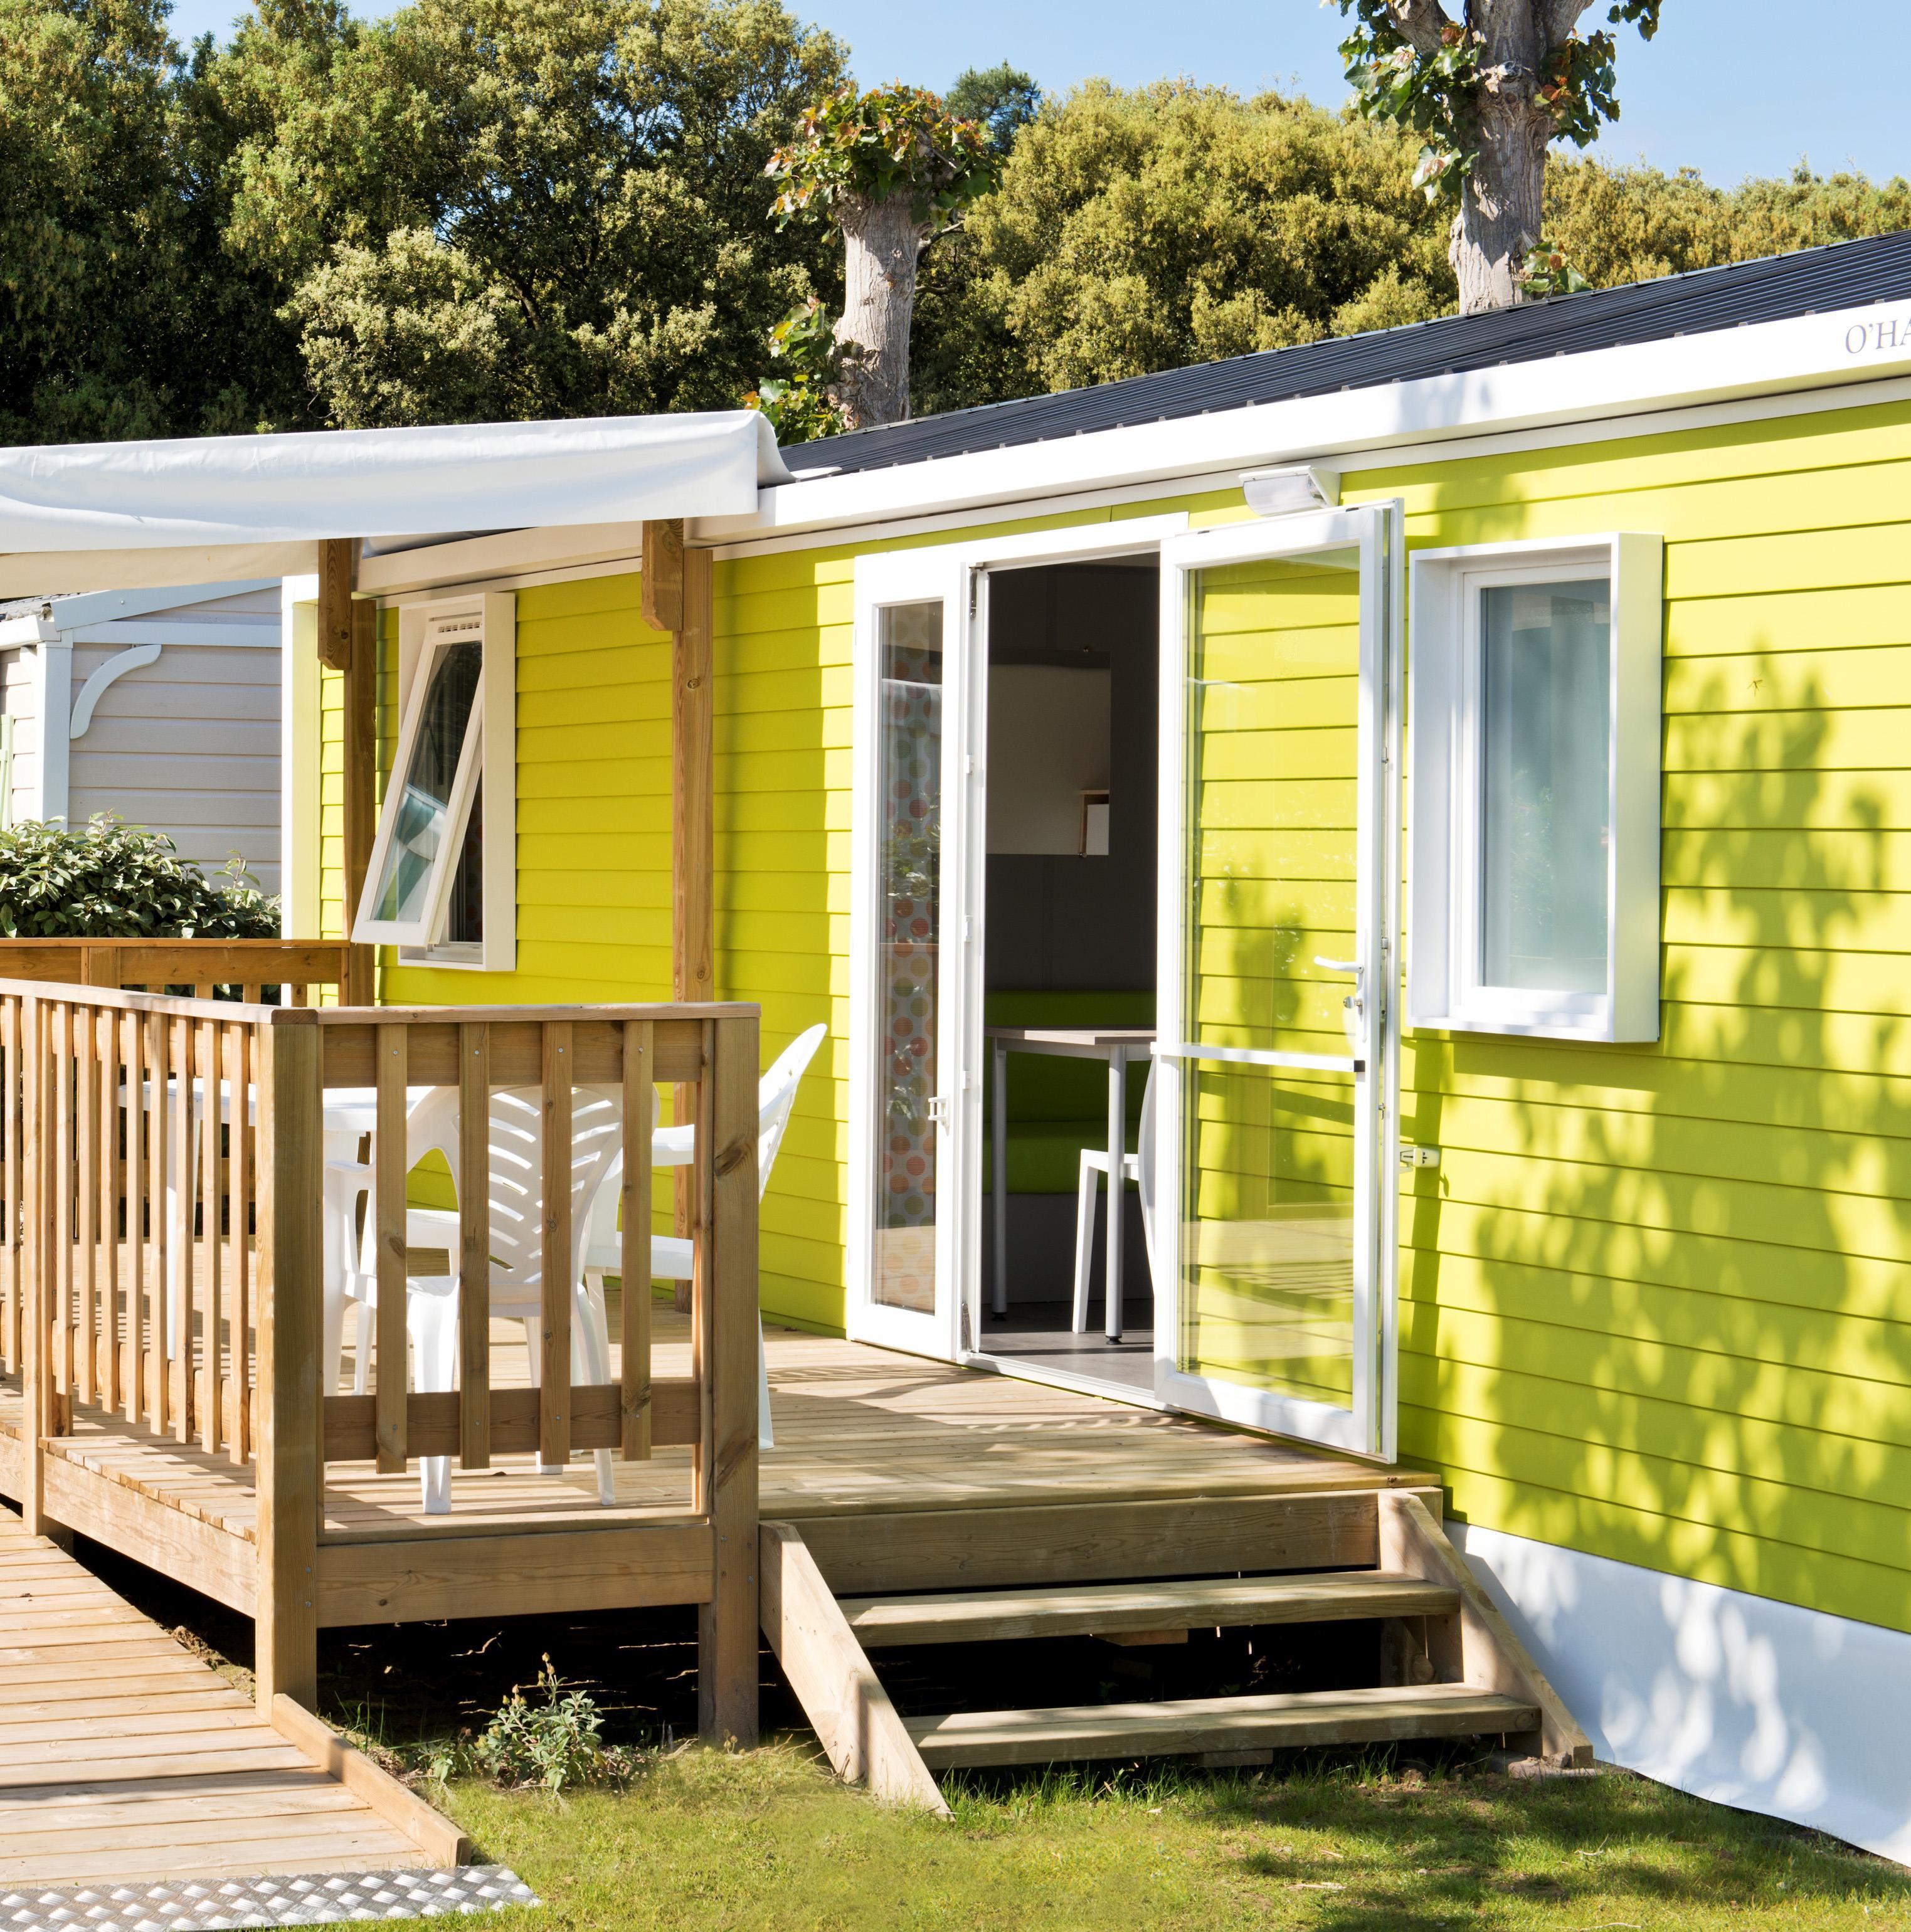 Location - Handi Casa, Pmr, Tv, Samedi - 2 Chambres - Camping L'Air Marin